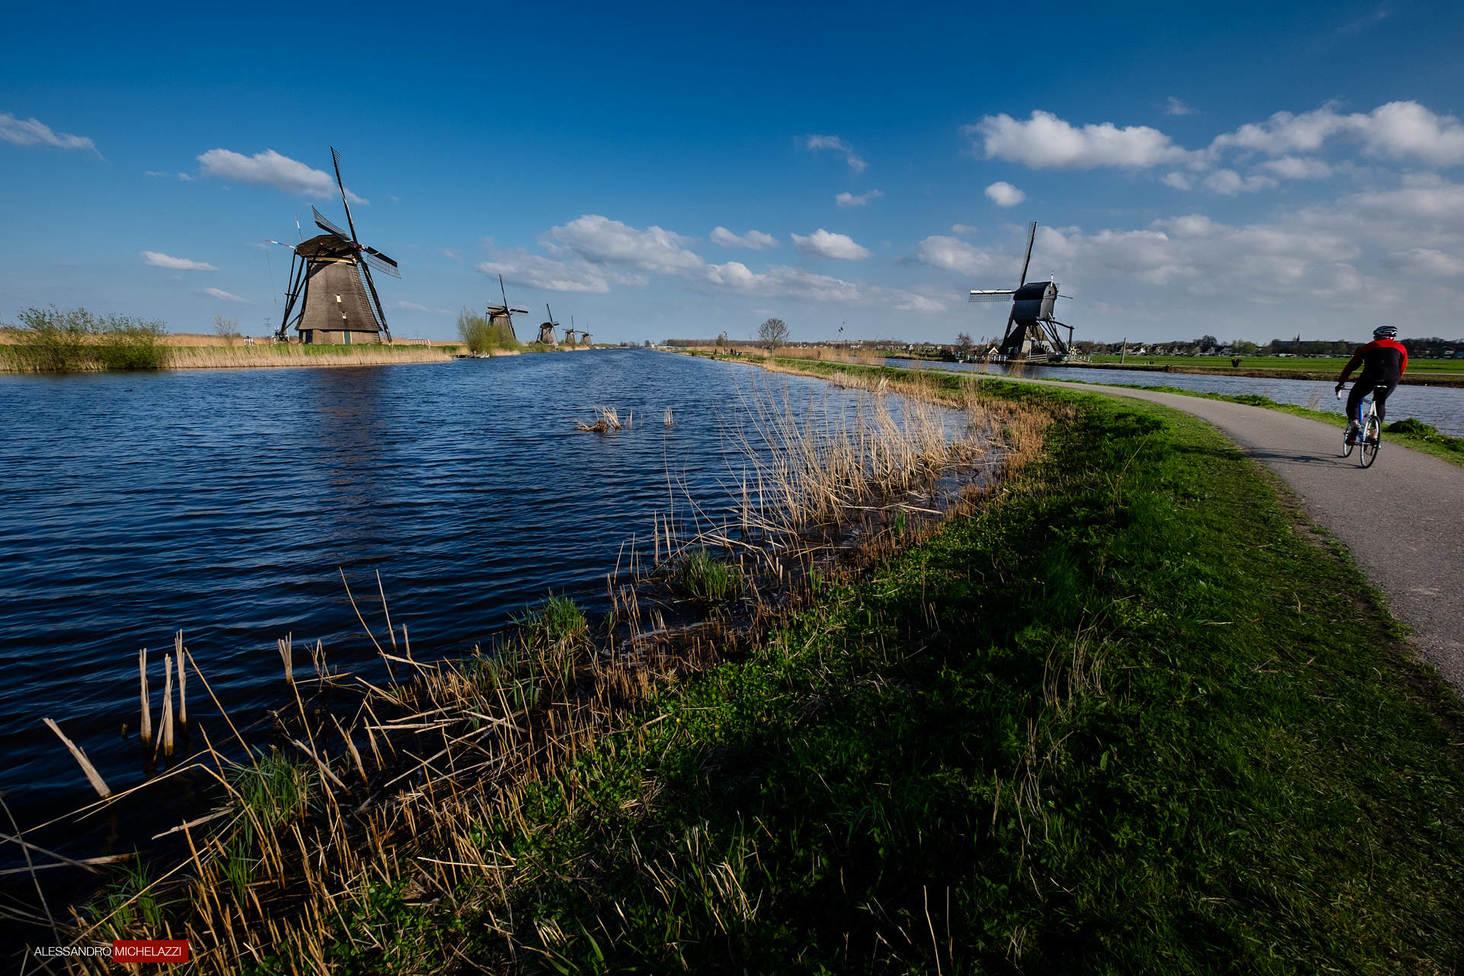 Netherlands-Alessandro-Michelazzi-1